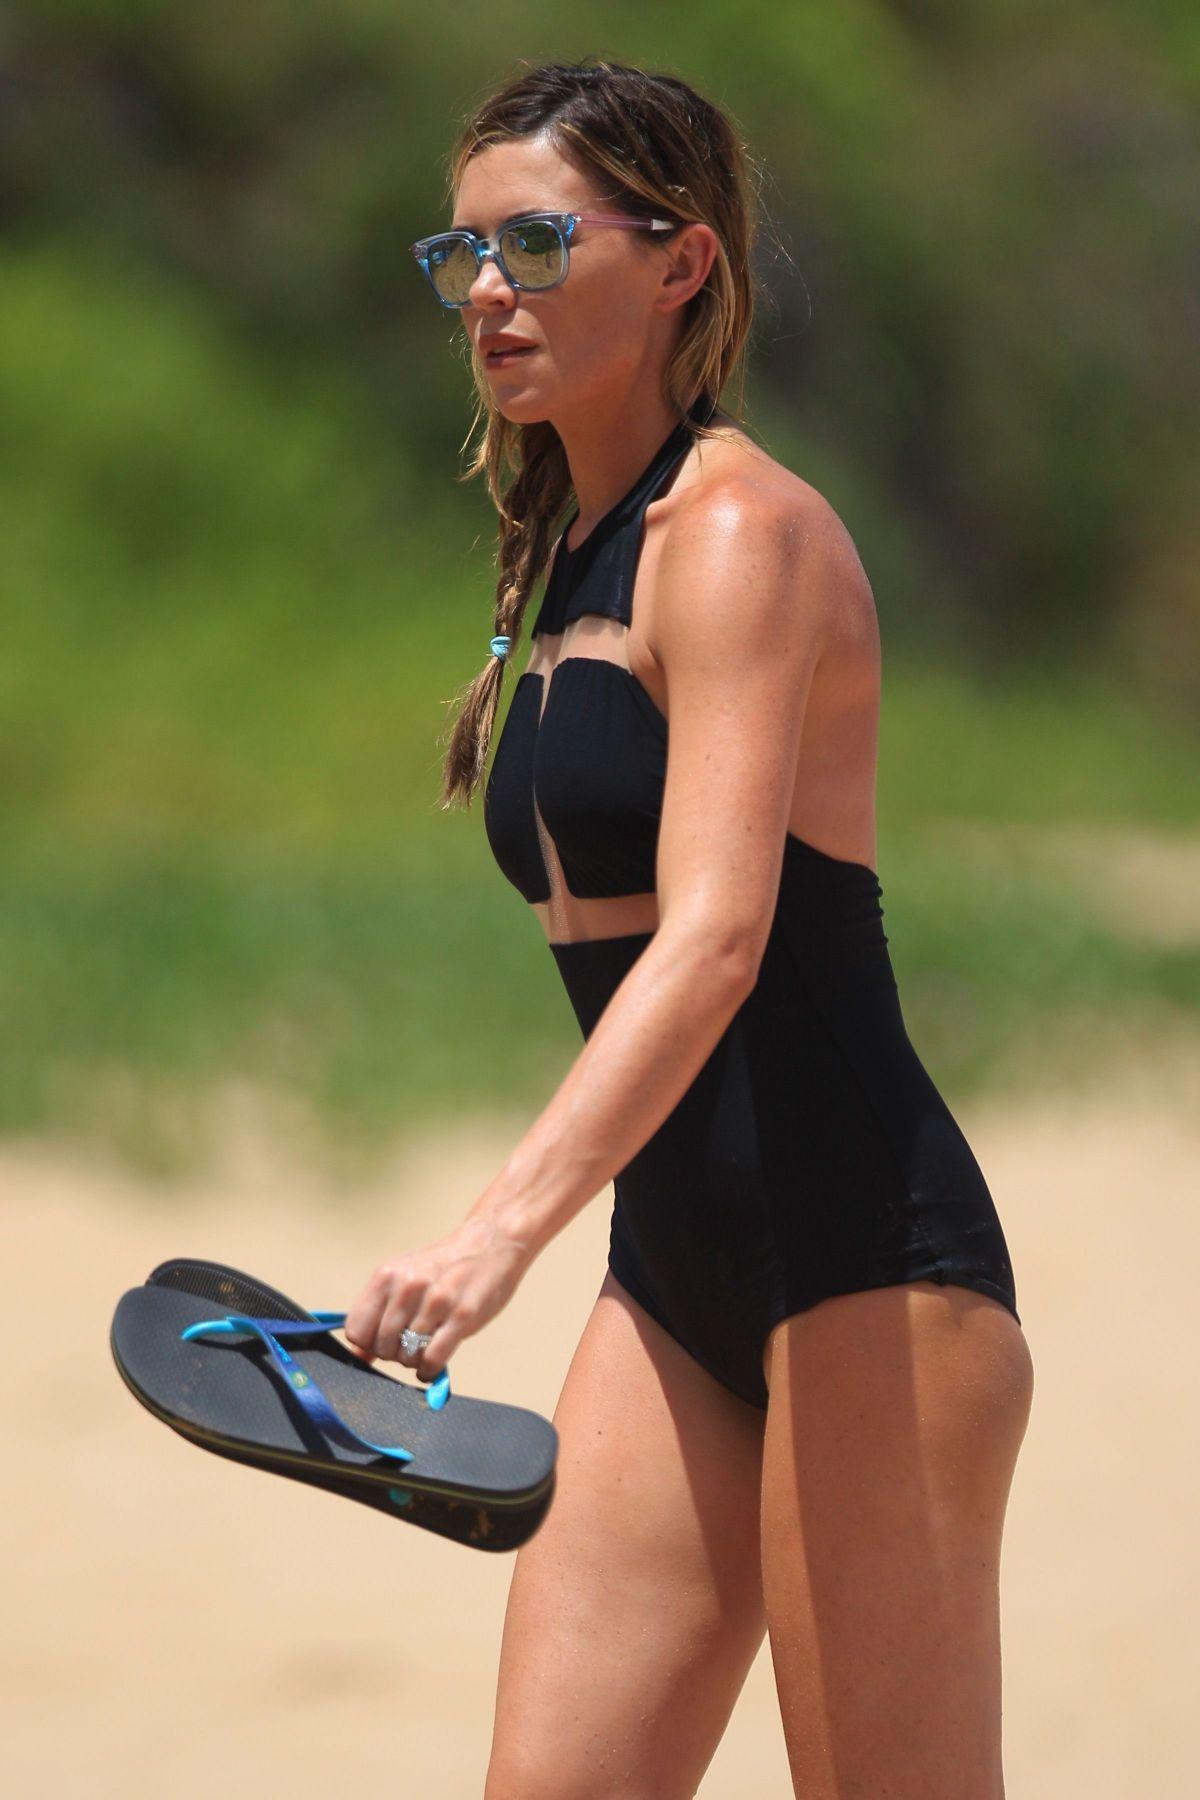 abigail clancy british swimsuit - photo #27